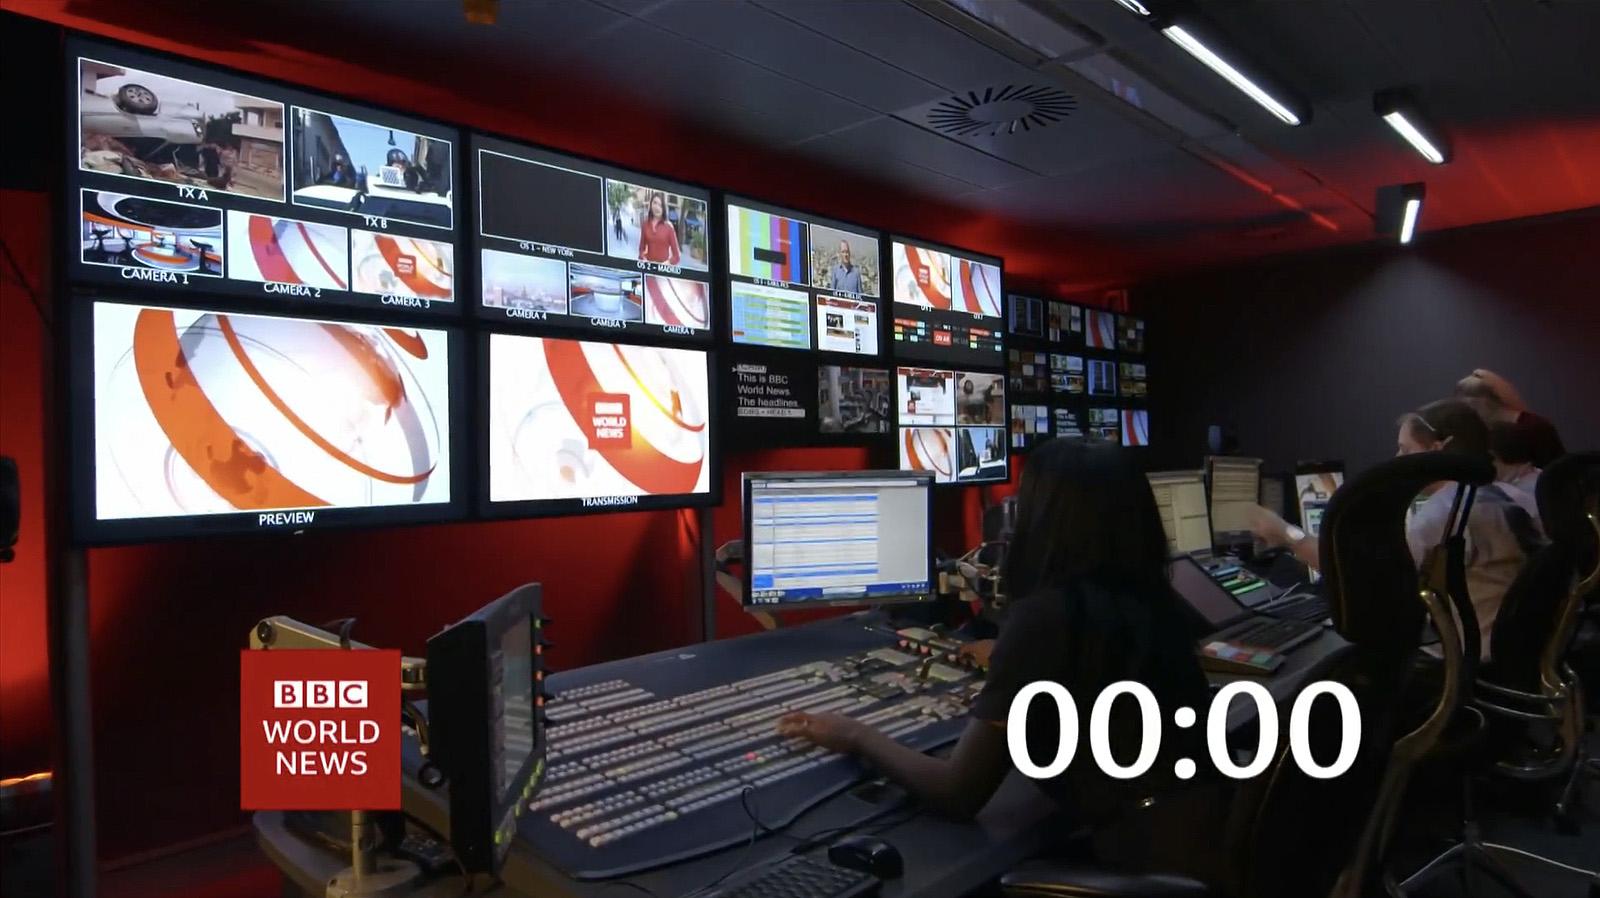 NCS_BBC-Rebrand-Reith-2019_021